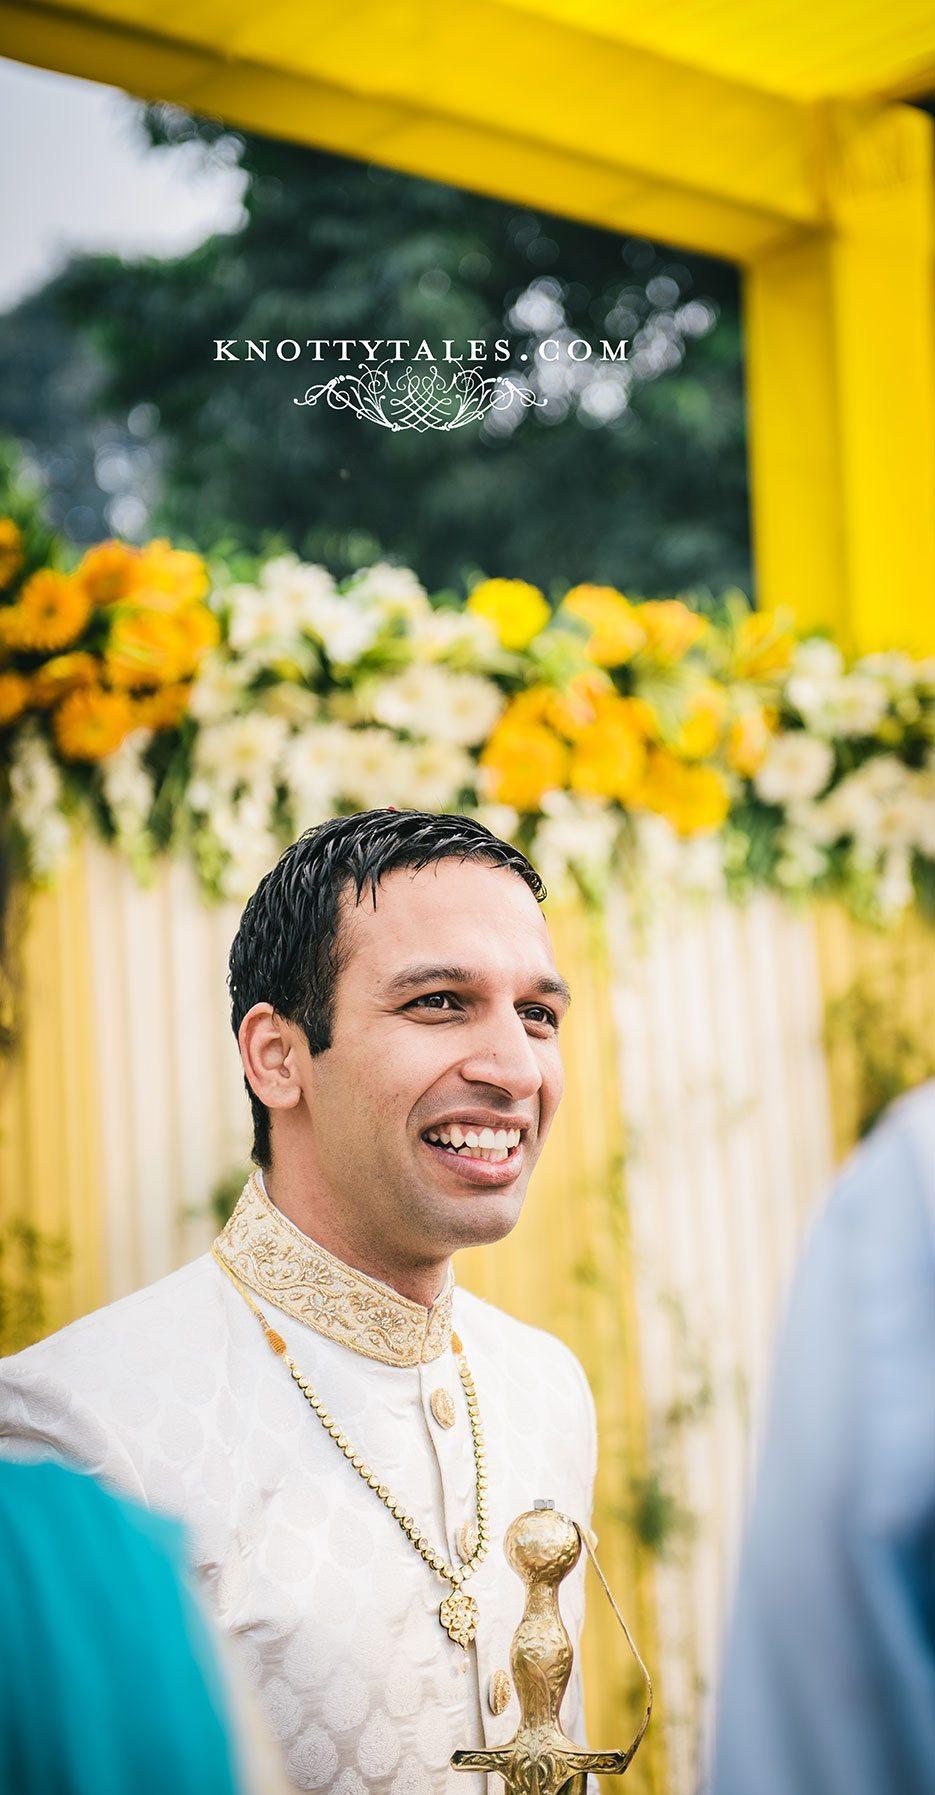 Gursimran-Sheleja-Wedding-Marriage-Knottytales-Naina-Indian-Wedding-Photography-50.jpg